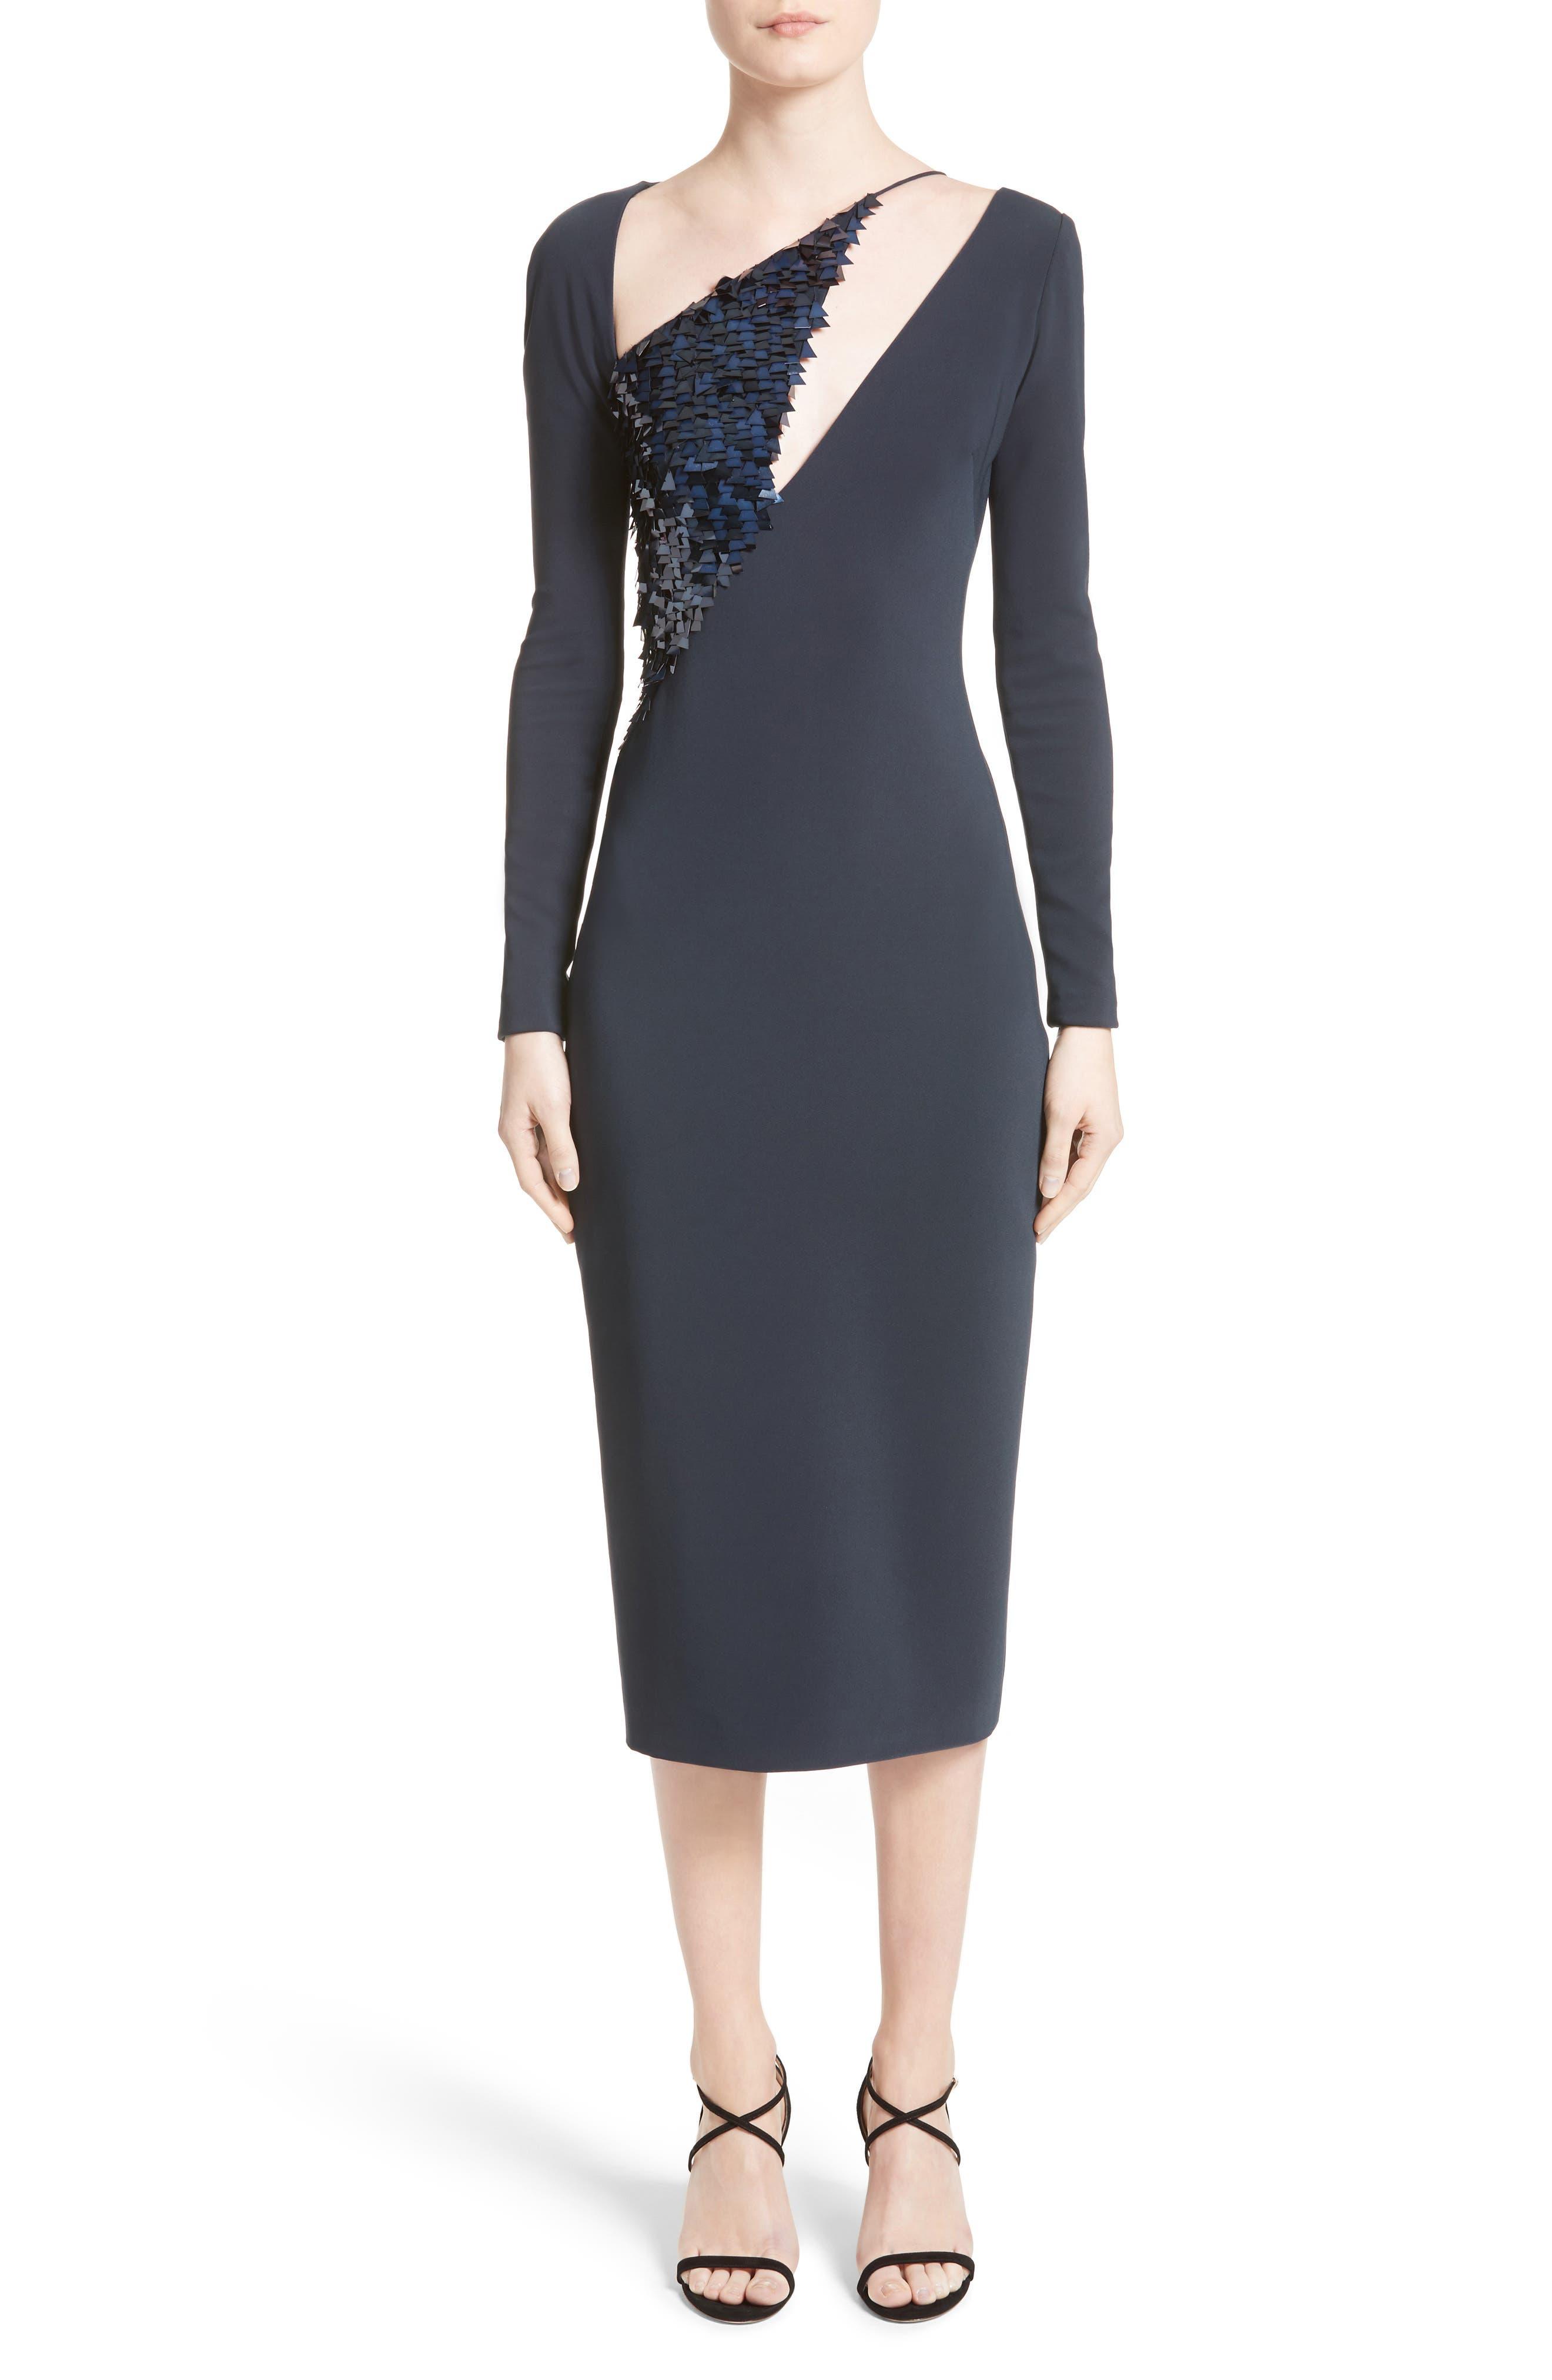 Main Image - Cushnie et Ochs Larissa Sequin Pencil Dress